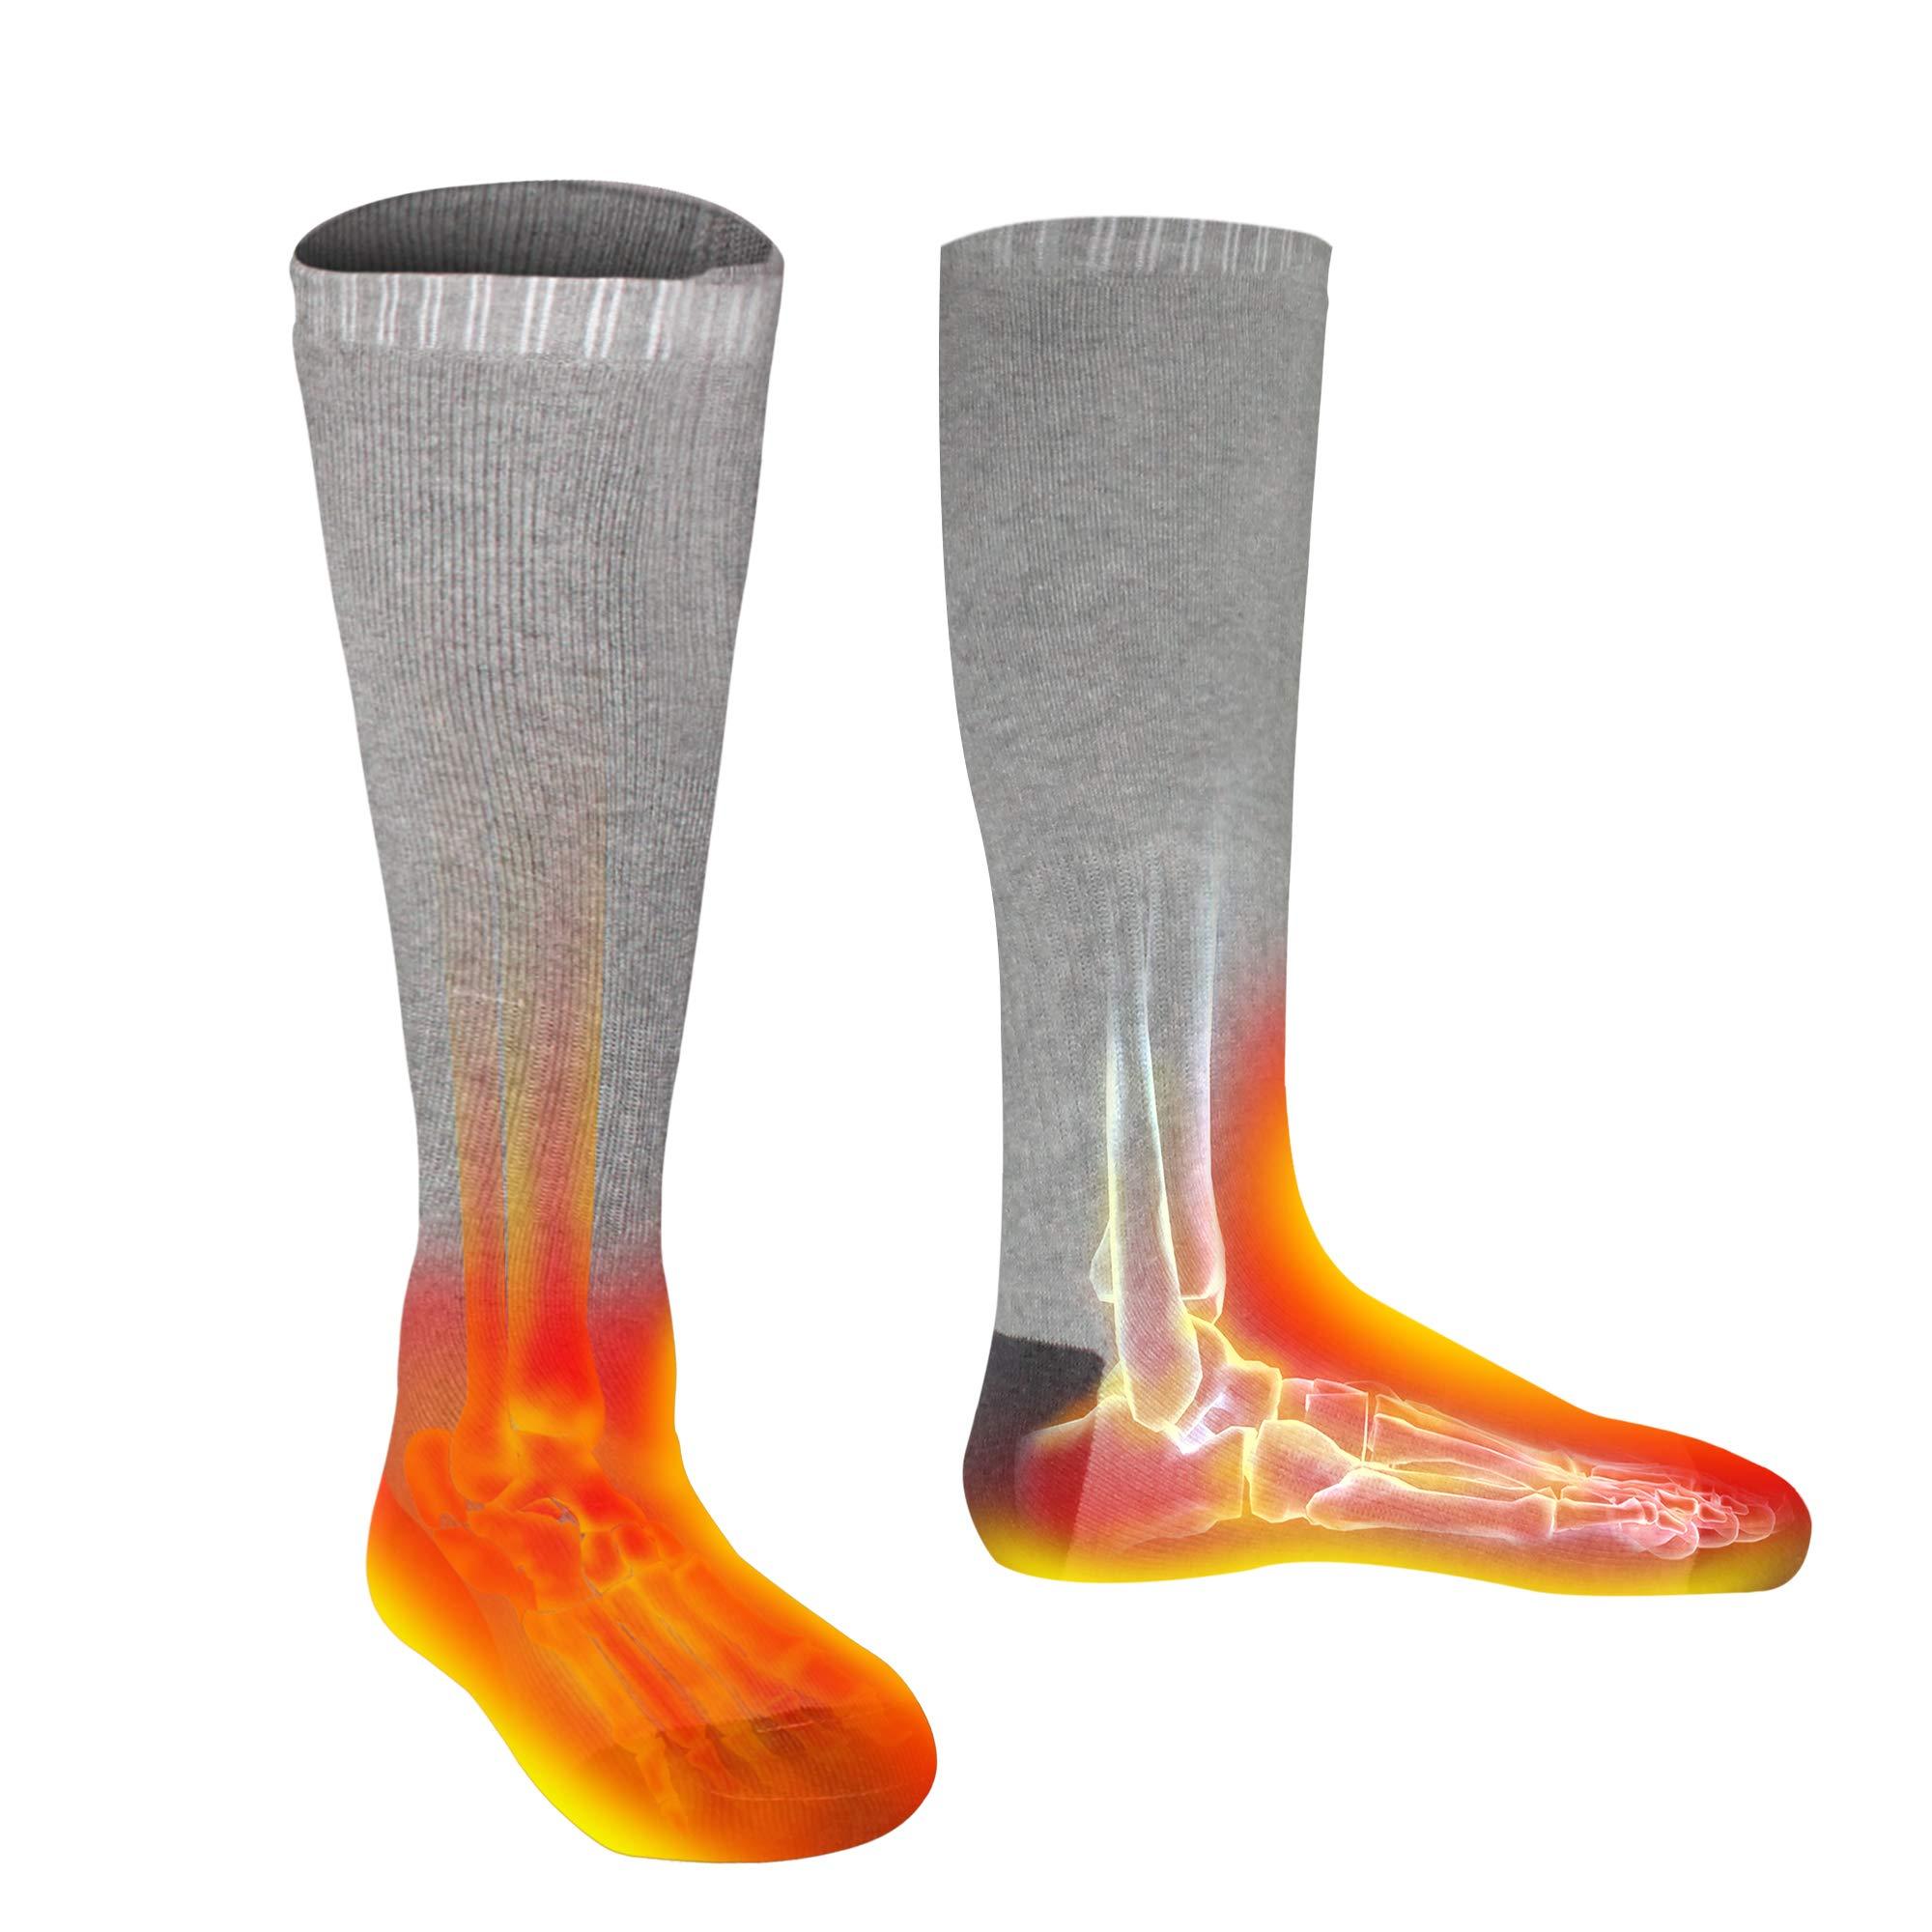 Men Women Socks Electric Socks Heated Socks for Chronically Cold Feet, Rechargeable Batteries Socks Hiking Socks Skiing Socks Socks(Gray) by Highting